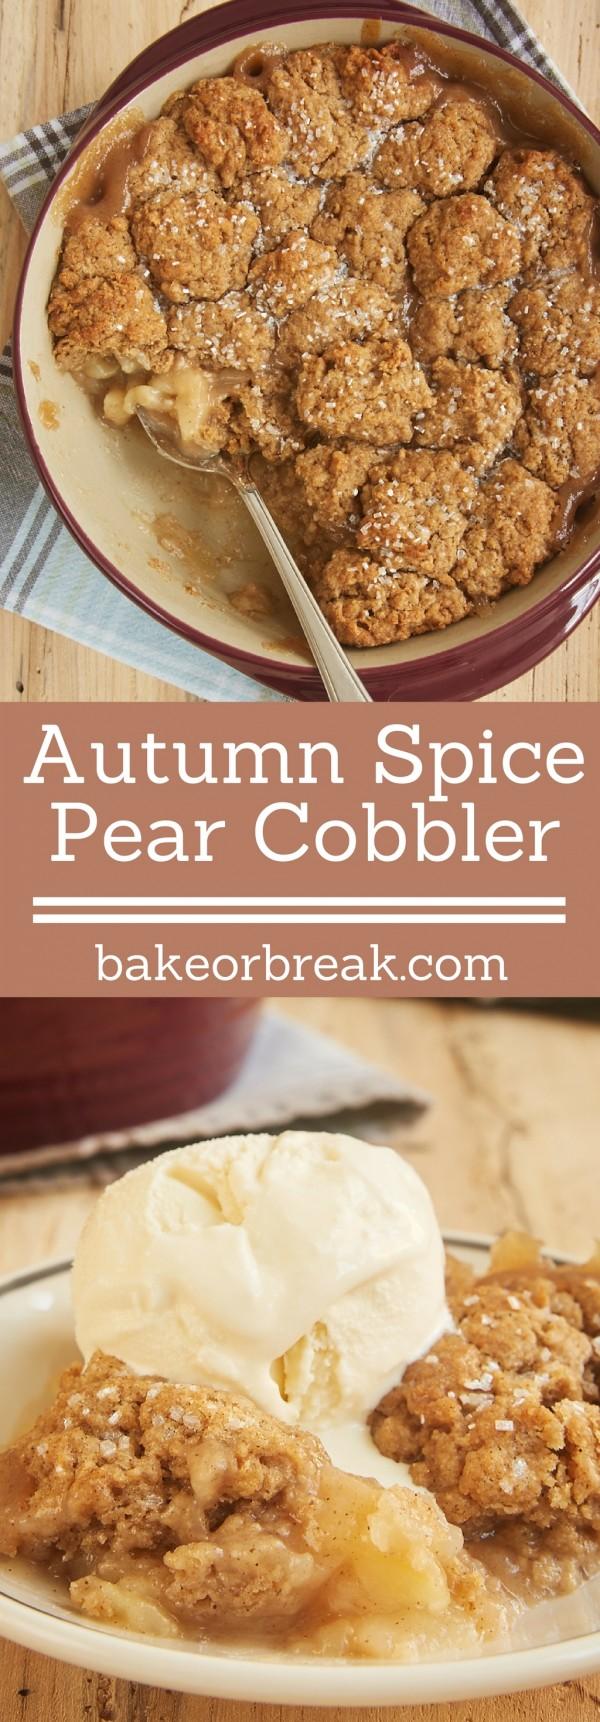 Get the recipe Autumn Spice Pear Cobbler @recipes_to_go